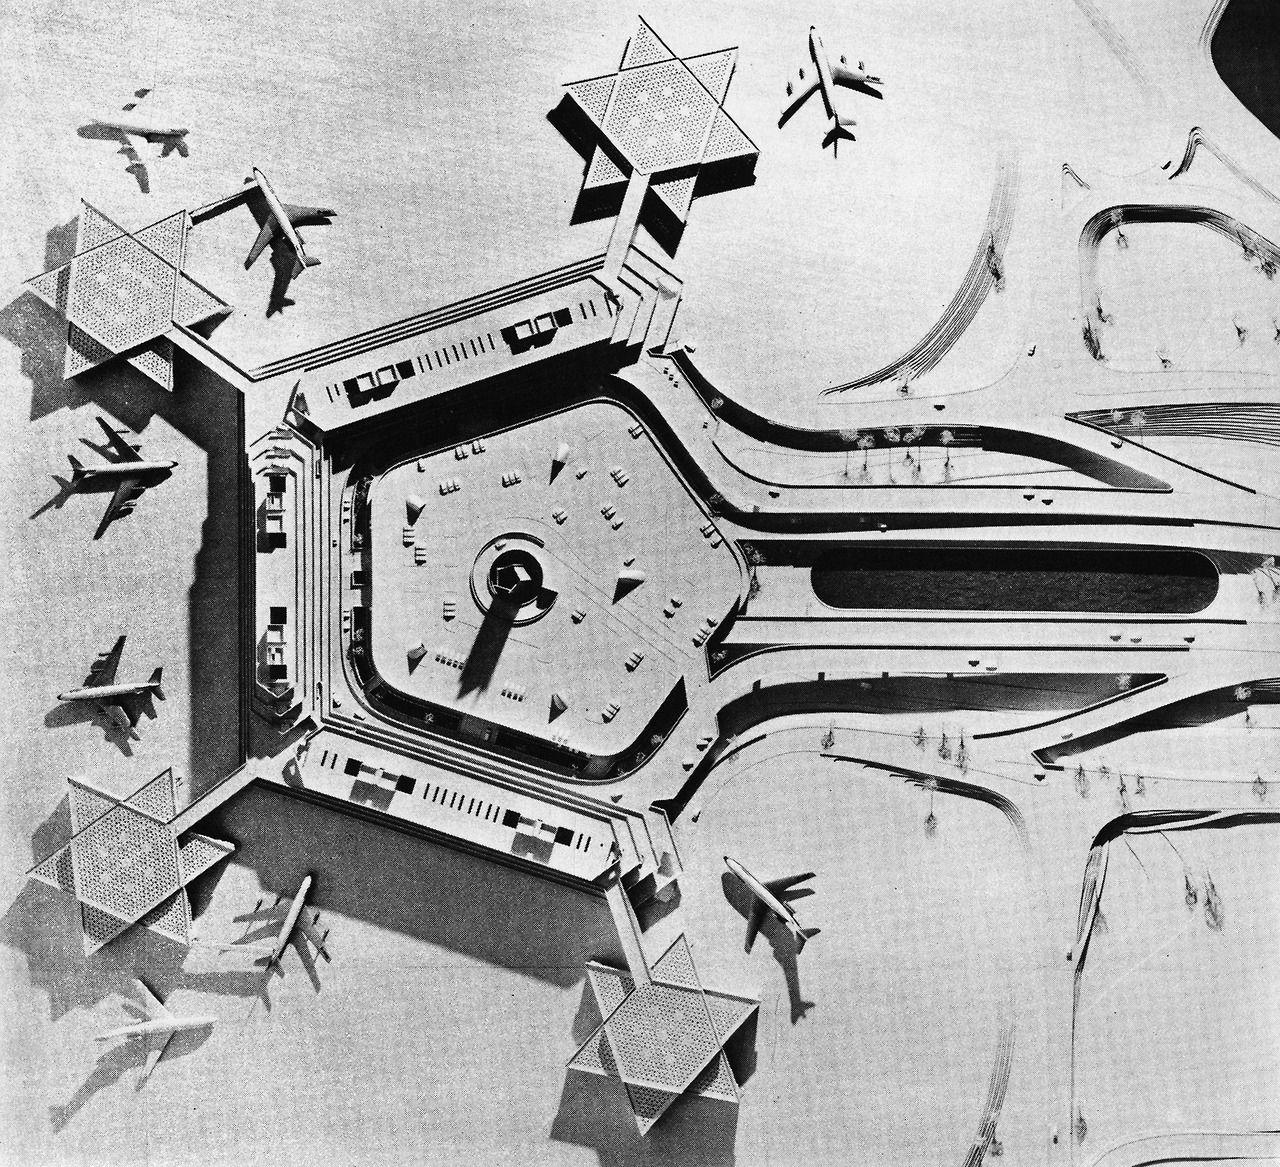 Cologne Bonn Irport 1966 70 Paul Schneider Esleben Architecture Books Architecture Model Gothic Architecture